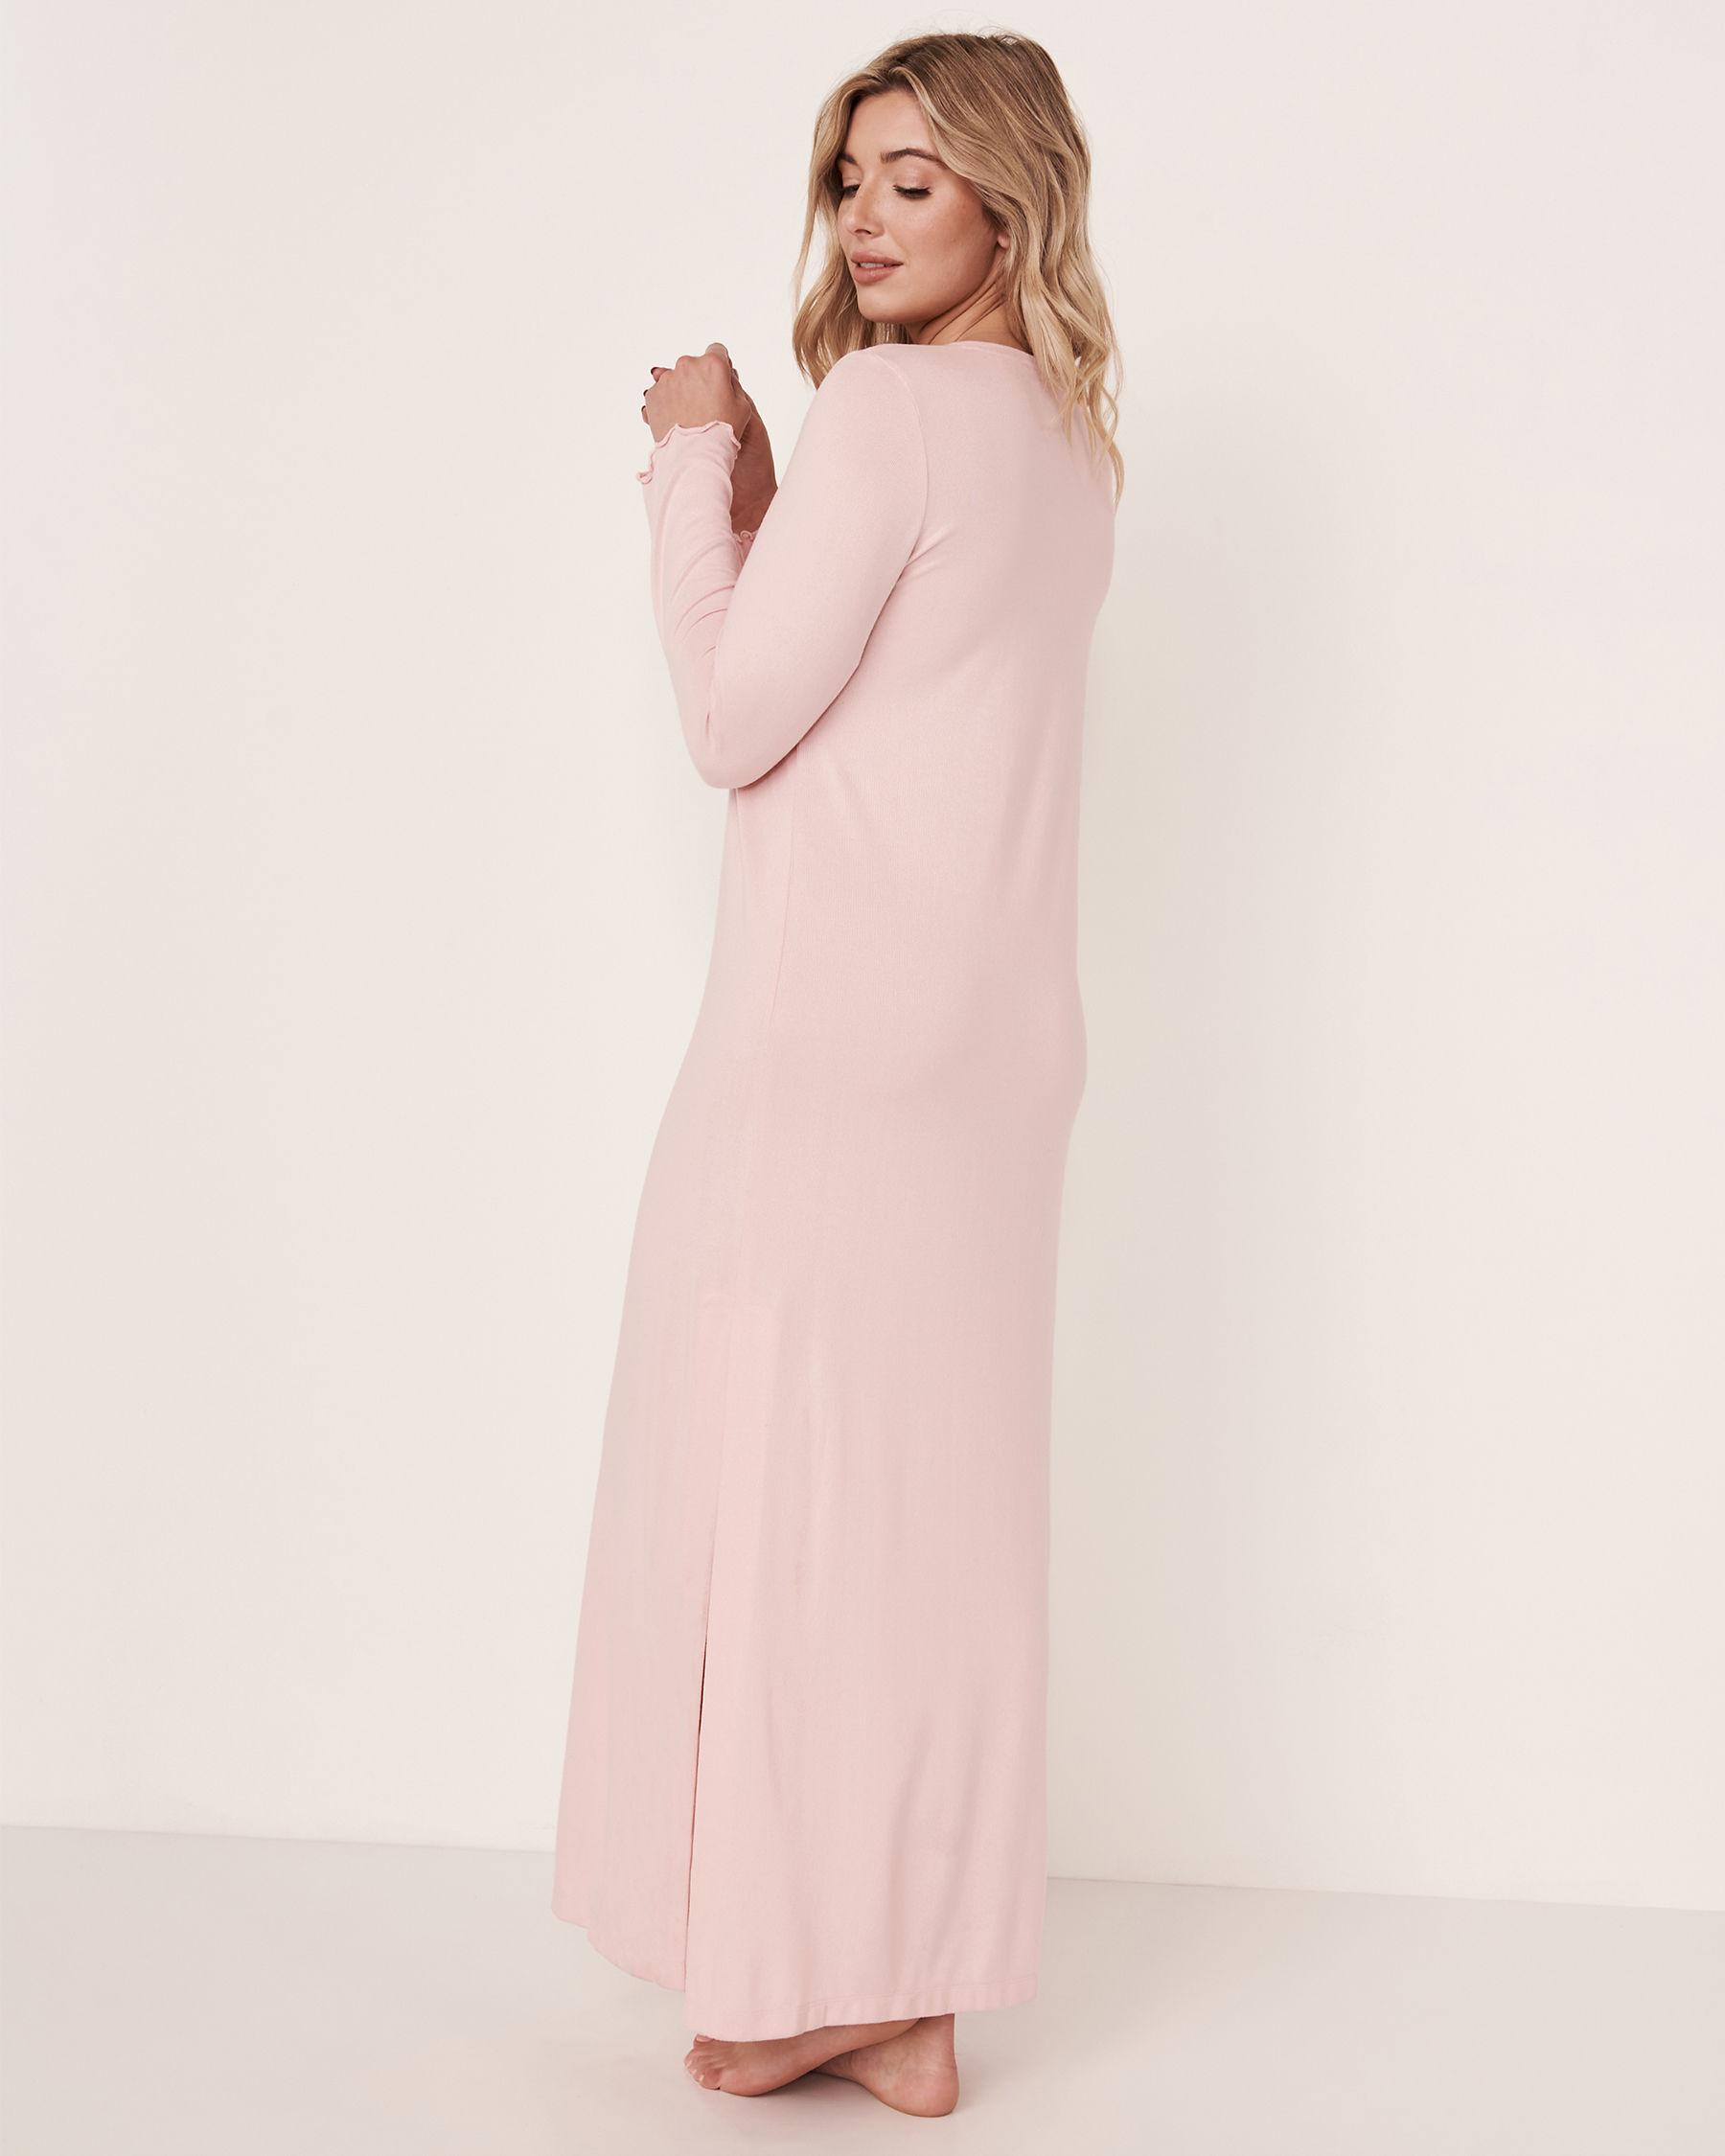 LA VIE EN ROSE Recycled Fibers Maxi Sleepshirt Light pink 40500068 - View3